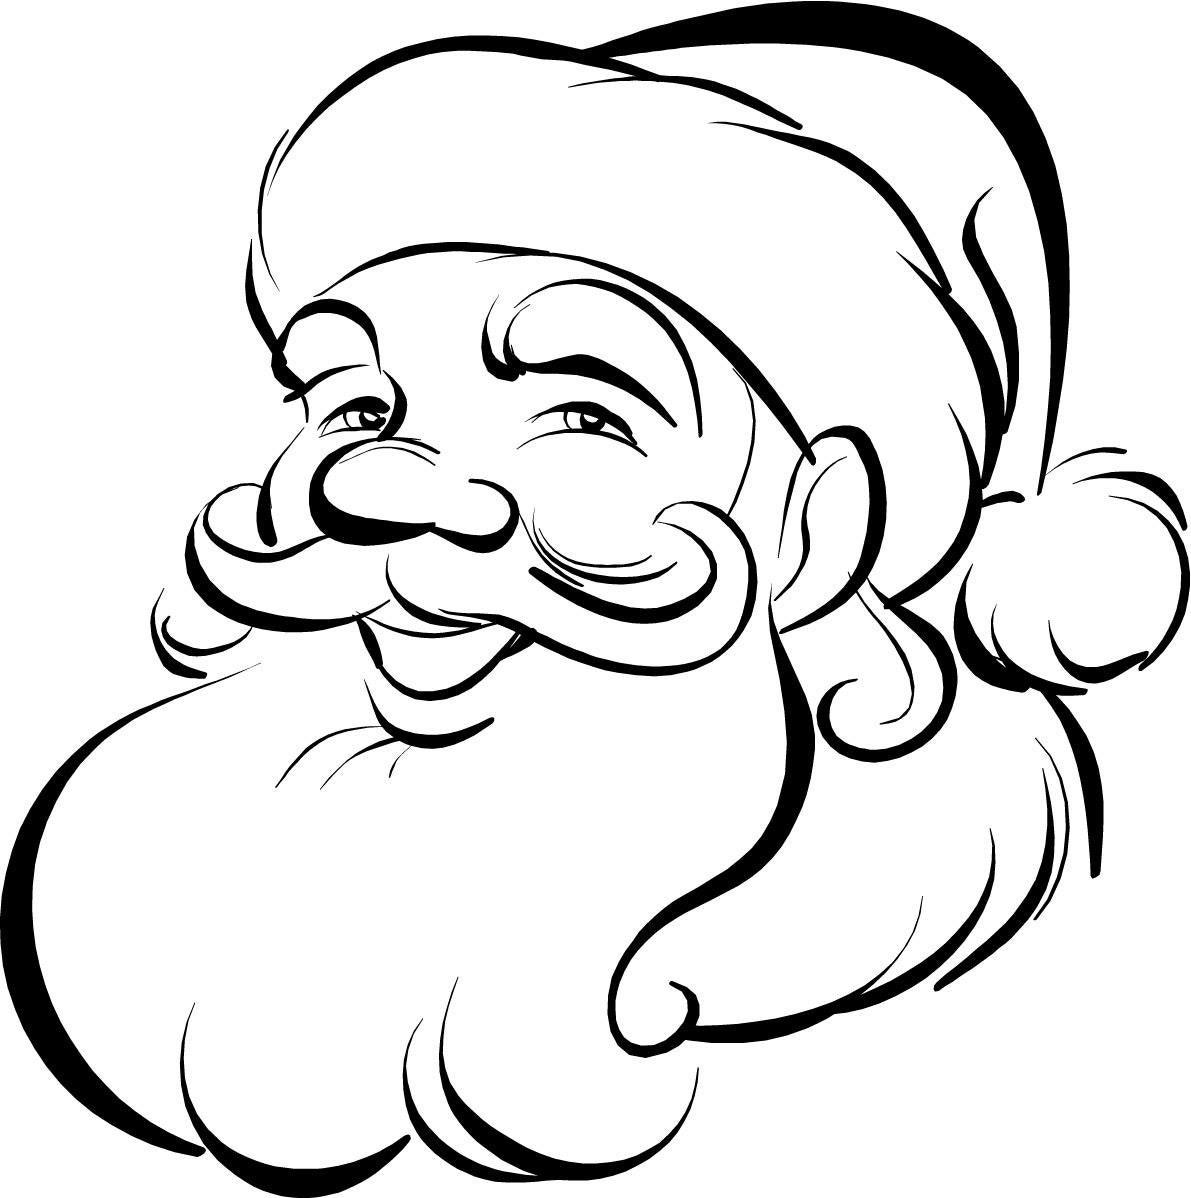 coloring pages santa claus face - photo#11